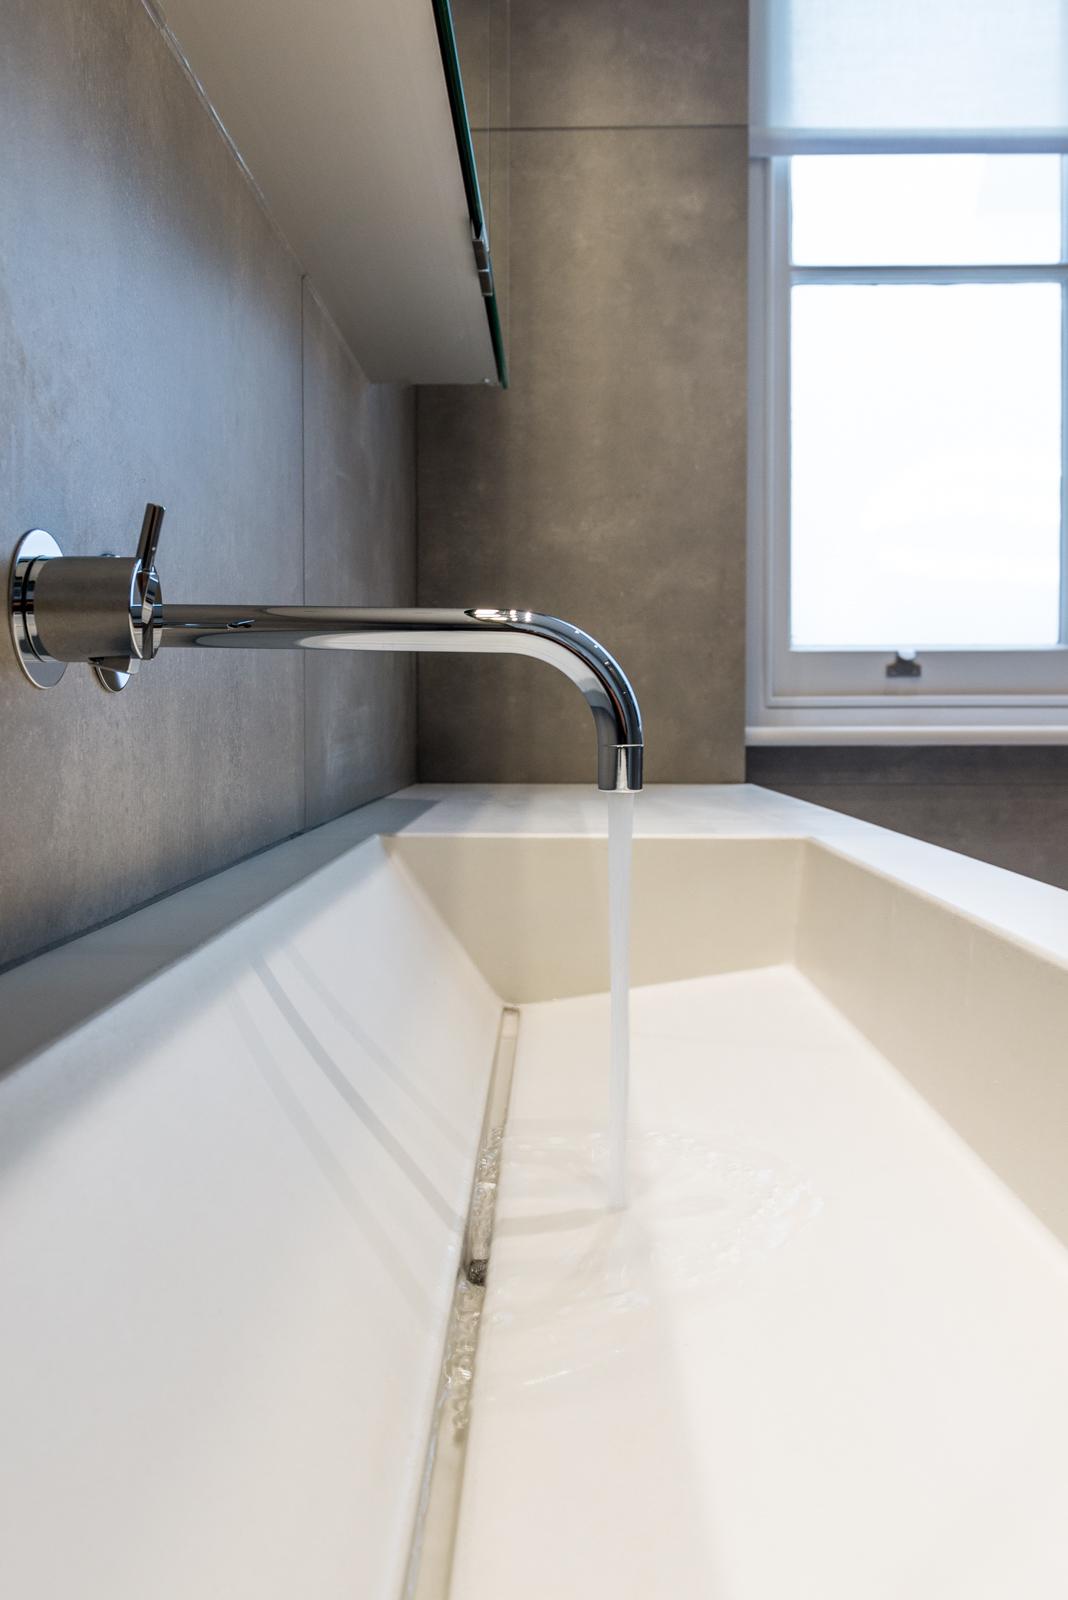 Infity-basin-sink.jpg